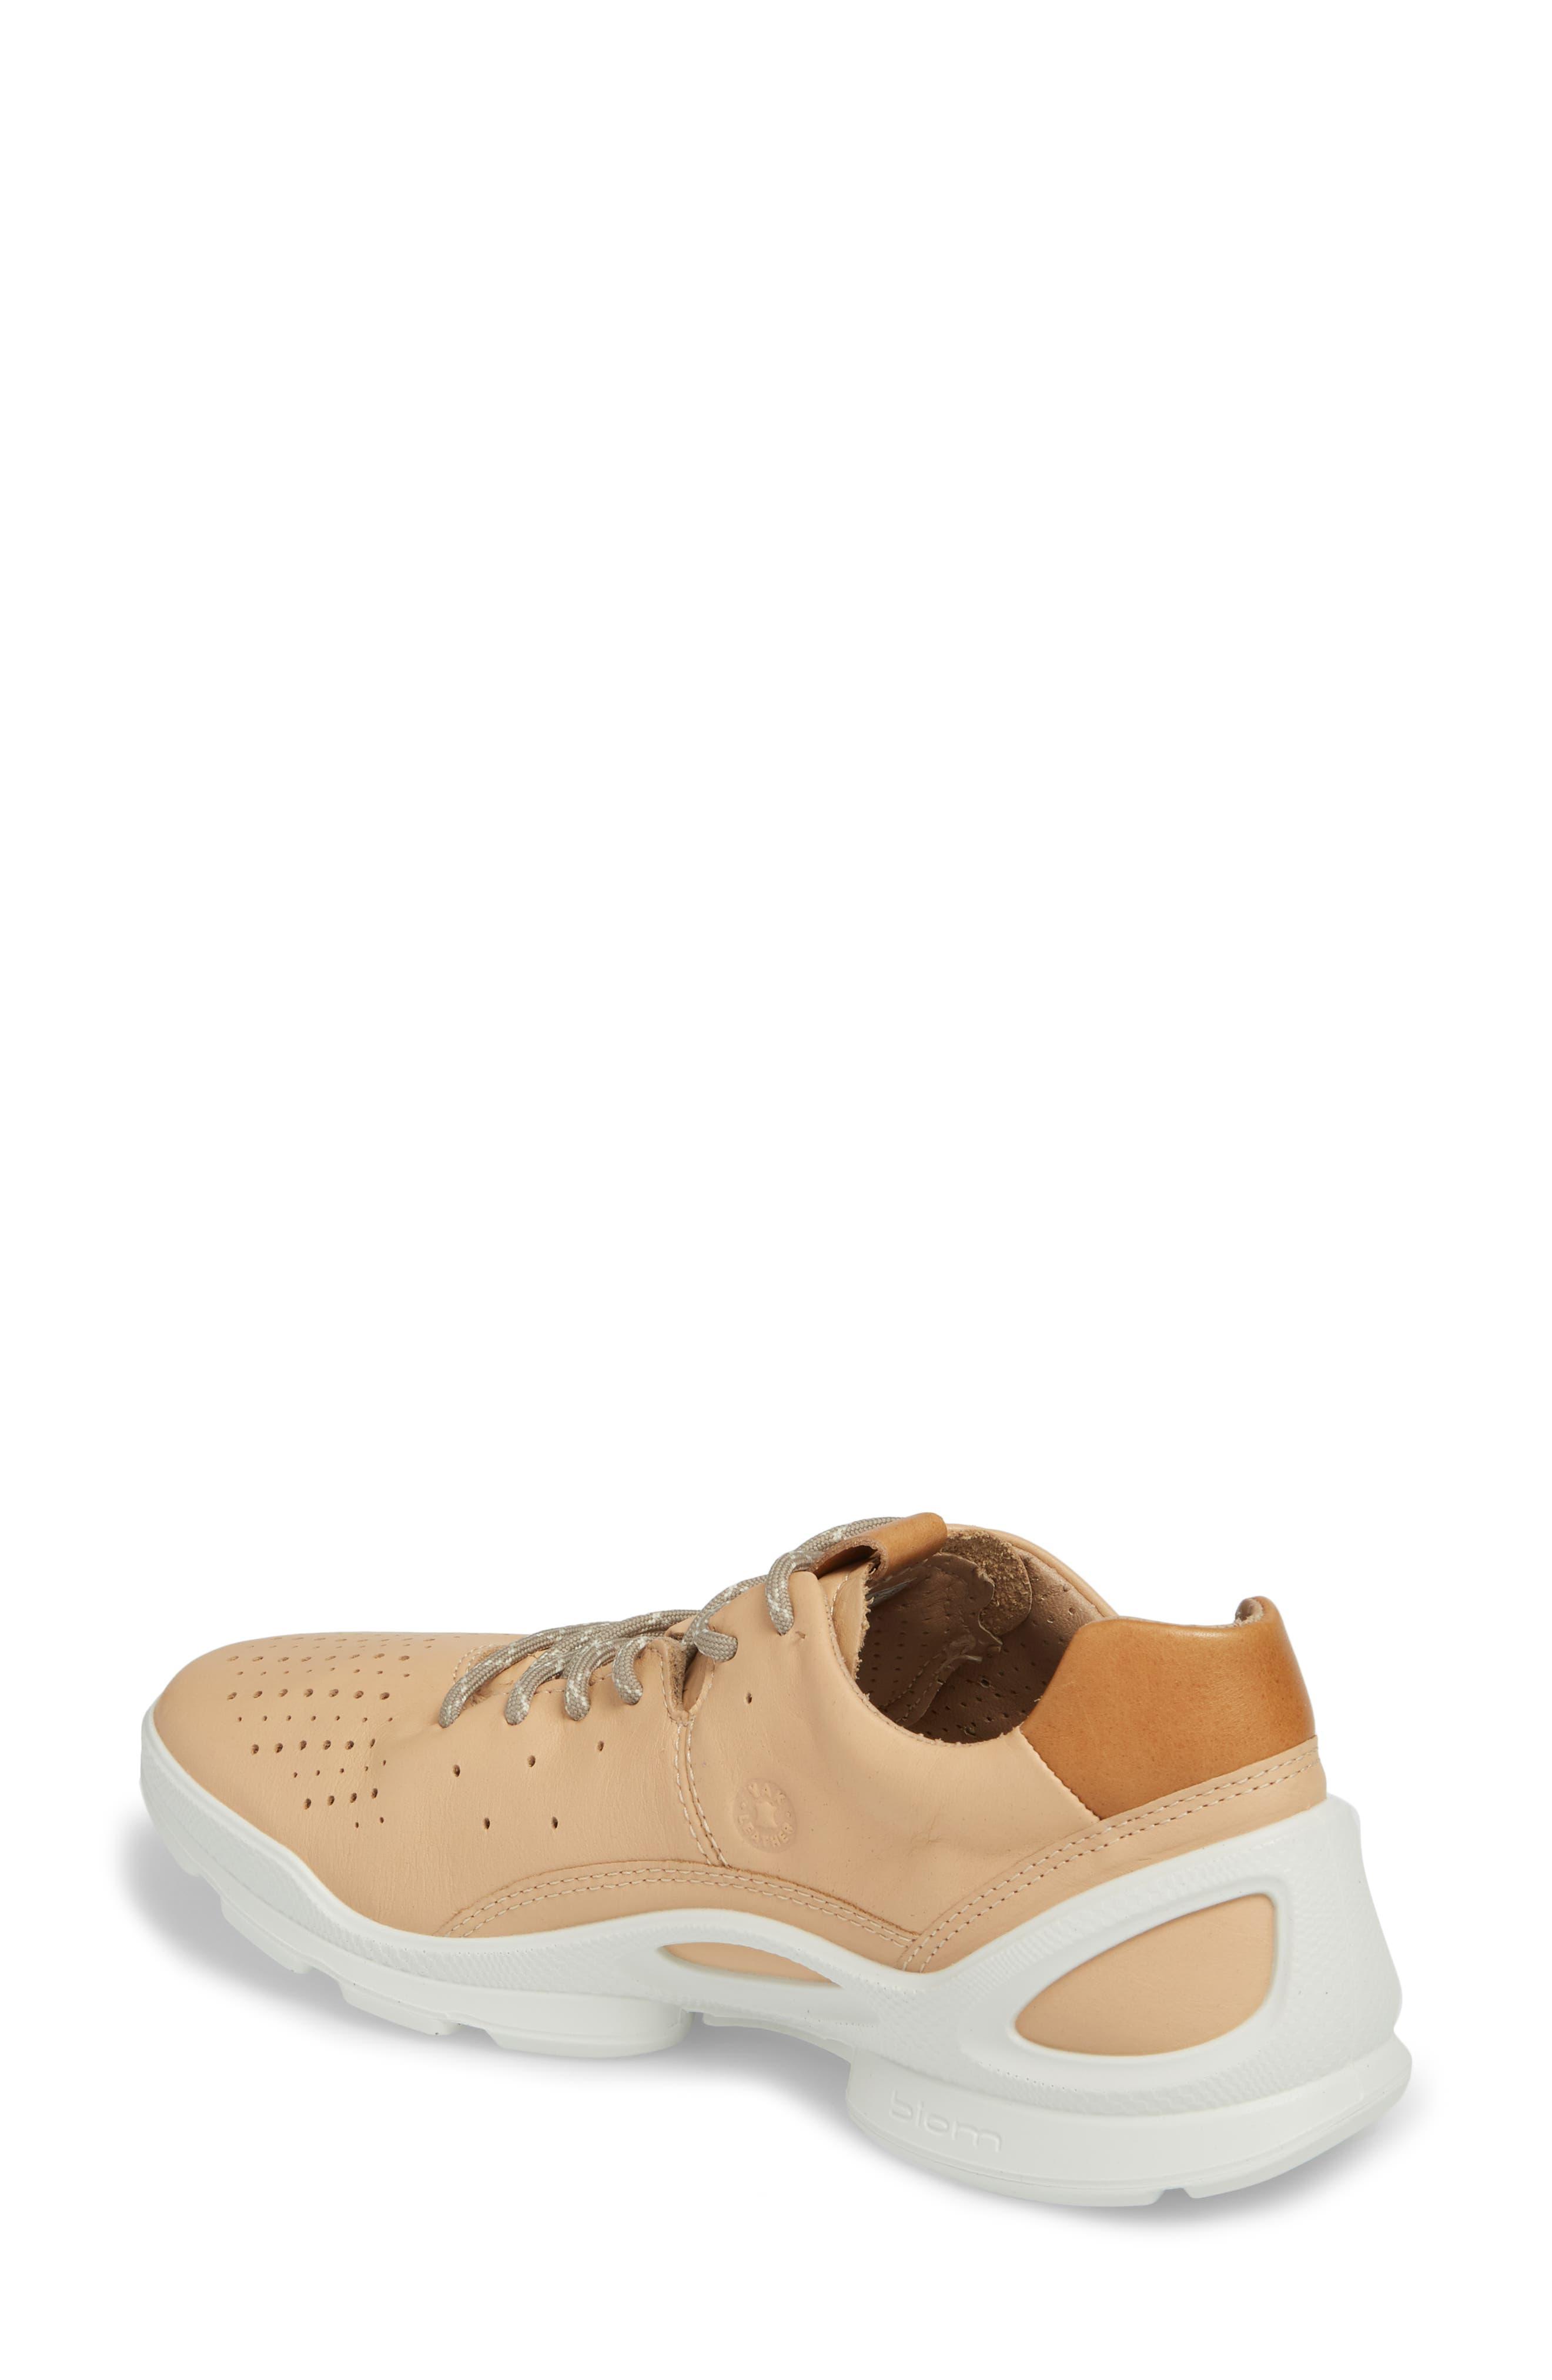 Biom Street Sneaker,                             Alternate thumbnail 2, color,                             024